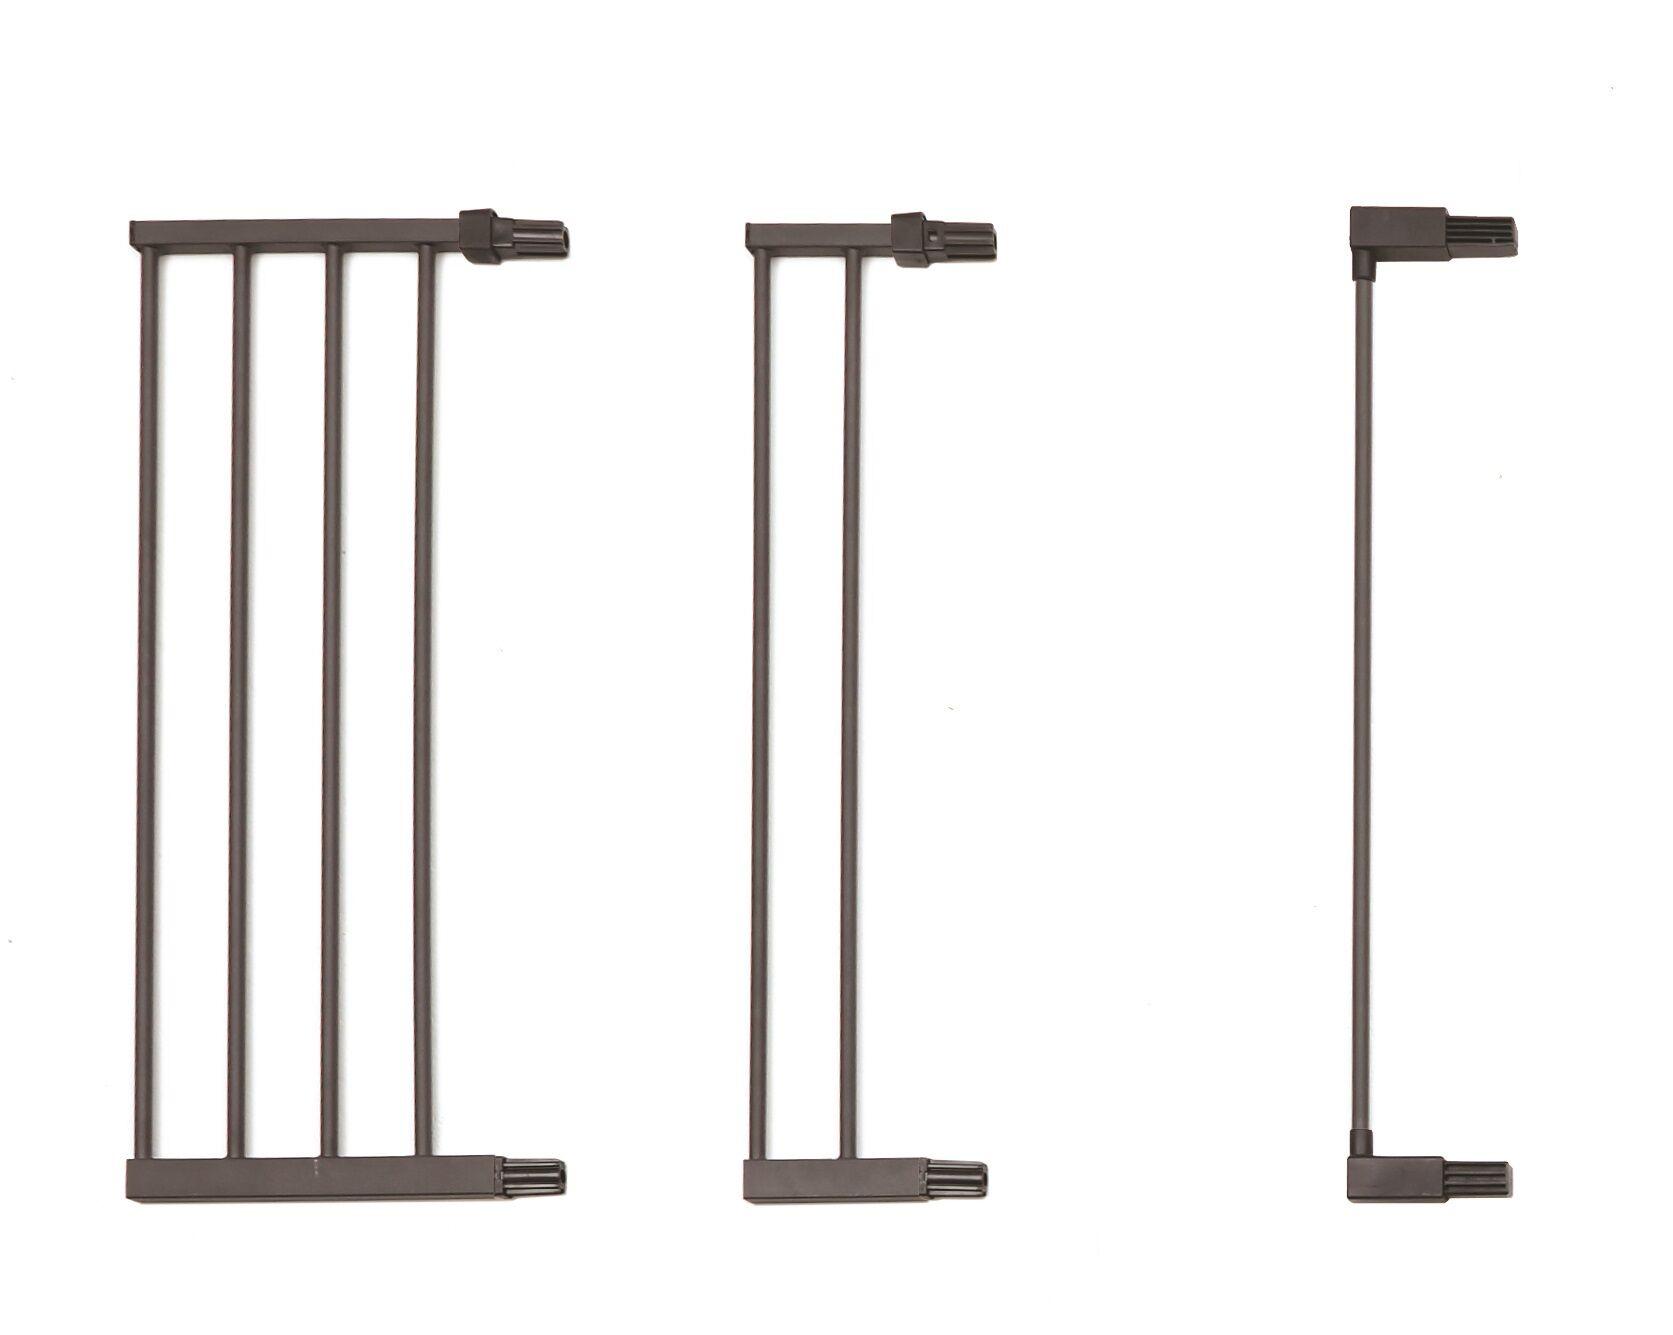 Steel Pet Gate Extension Size: 29